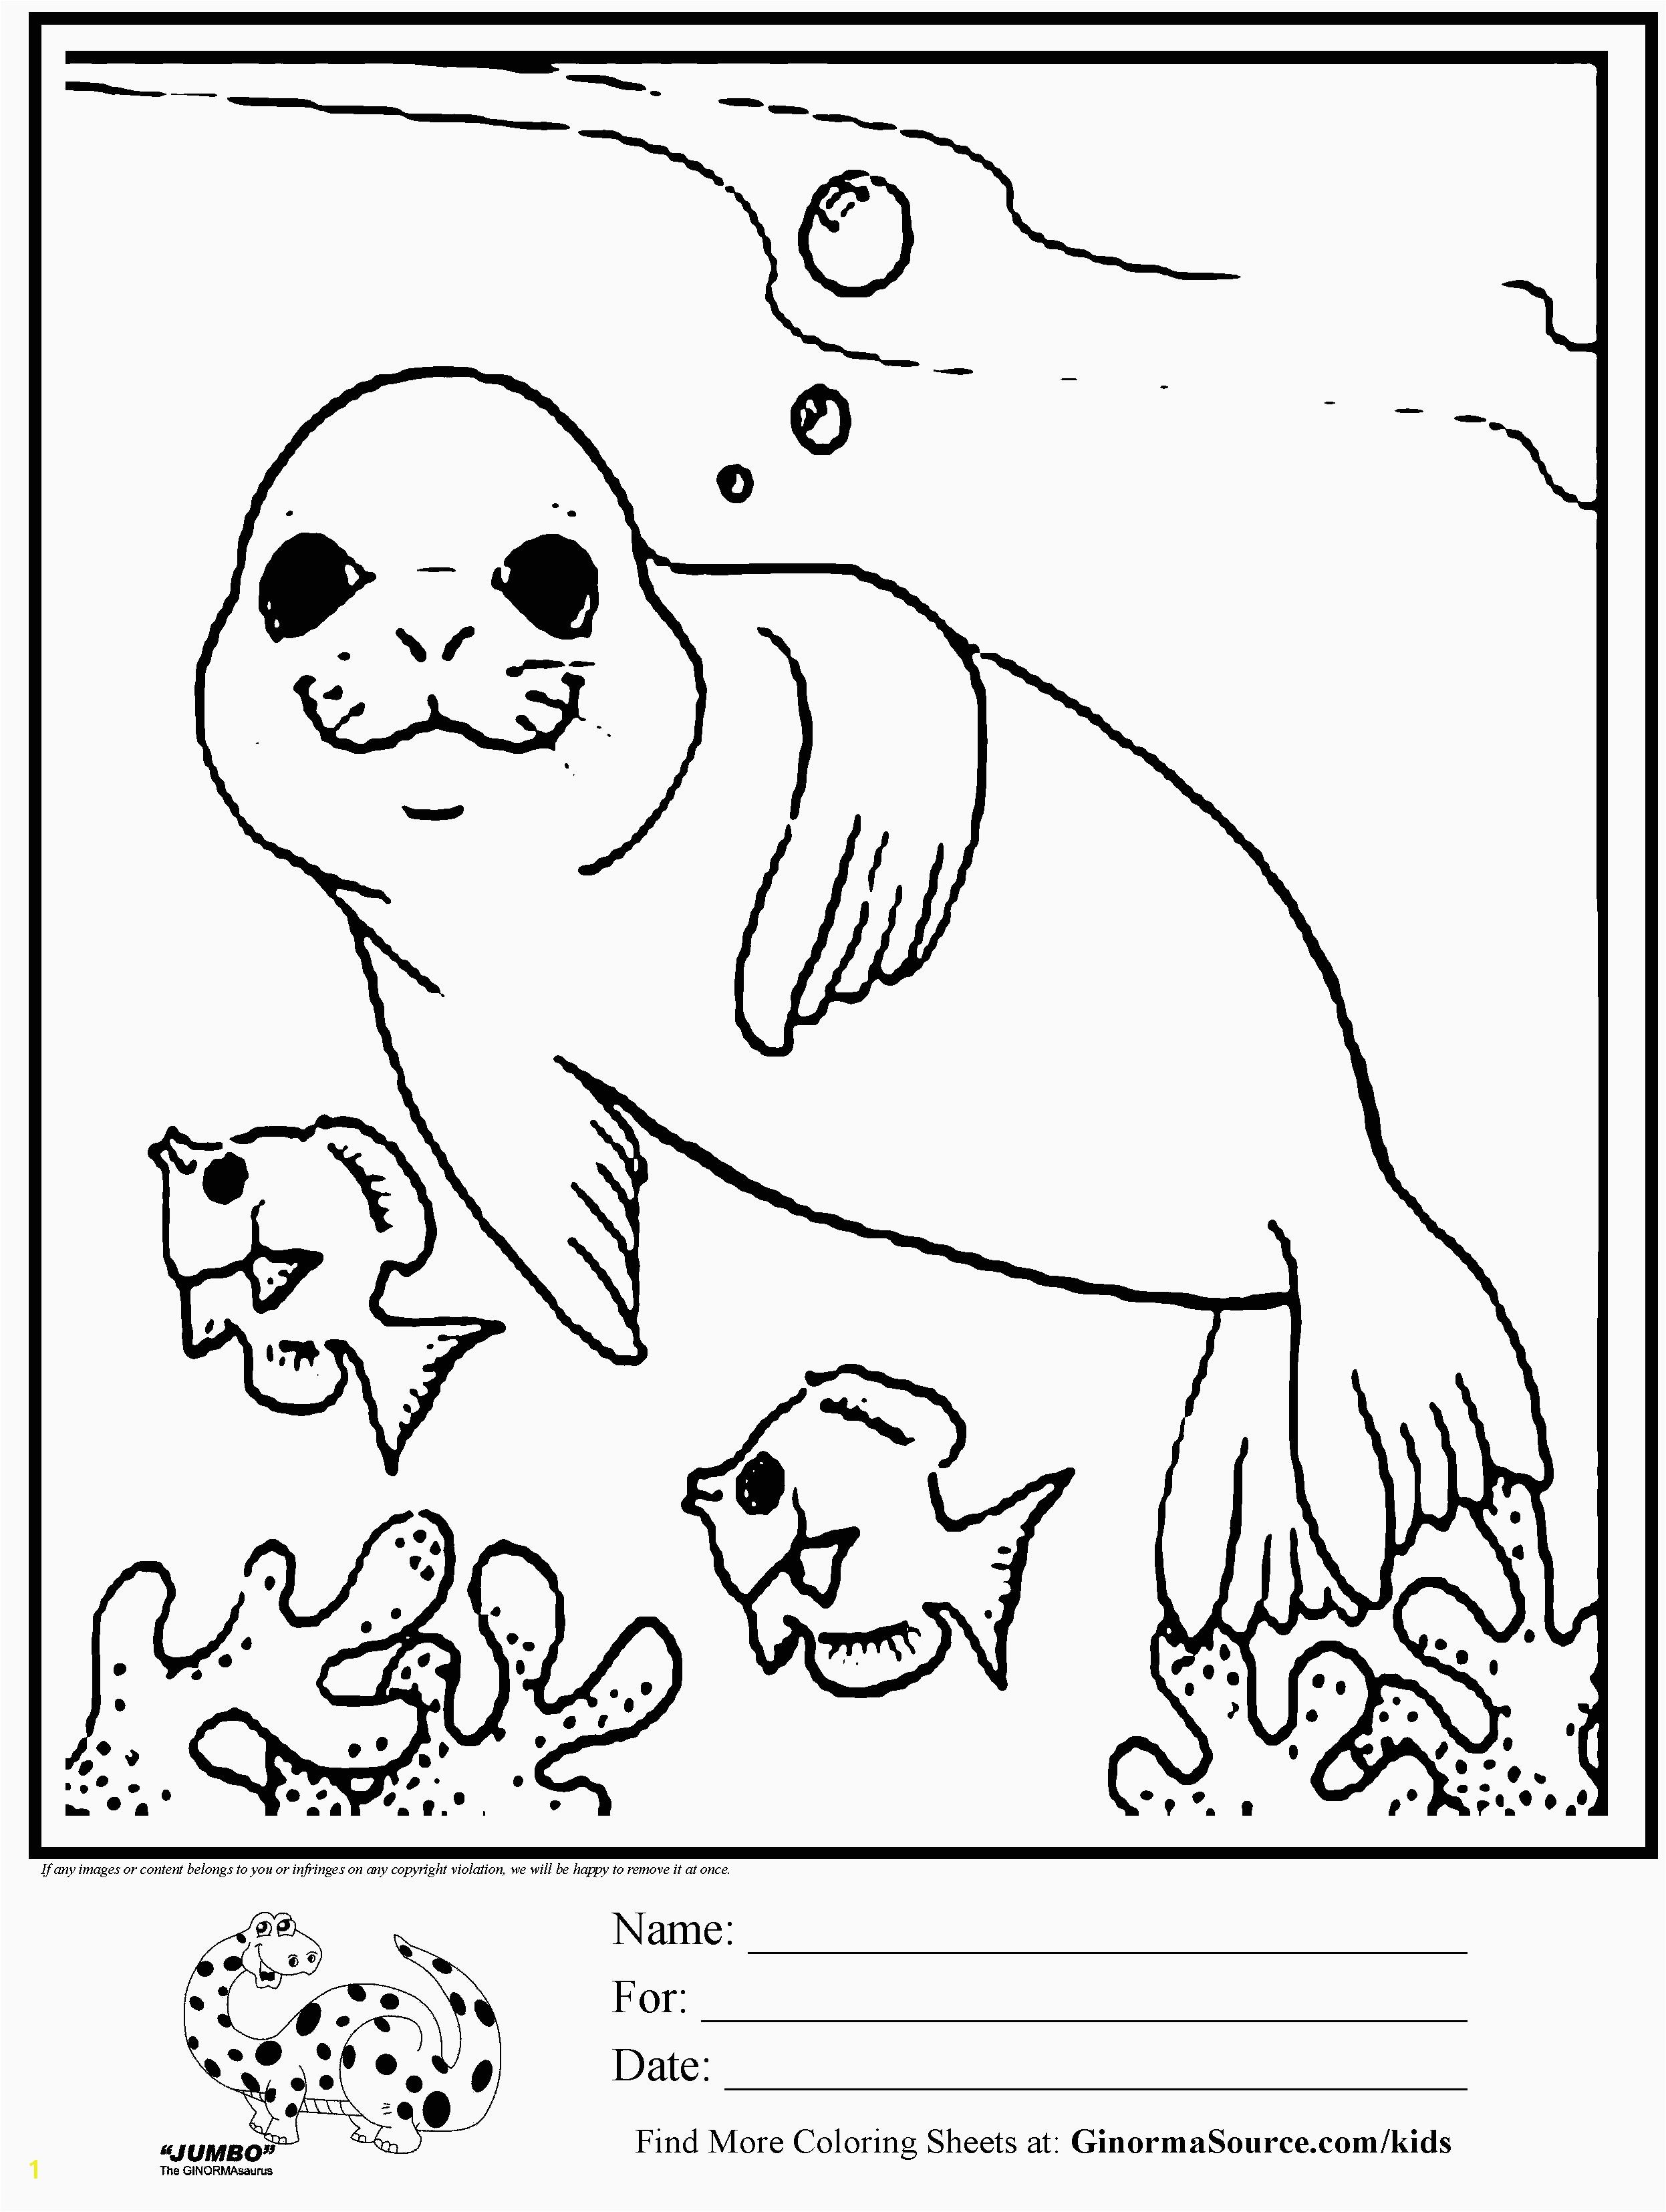 Free Precious Moments Coloring Pages Precious Moments Coloring Pages Girl Printable Best Od Dog Coloring